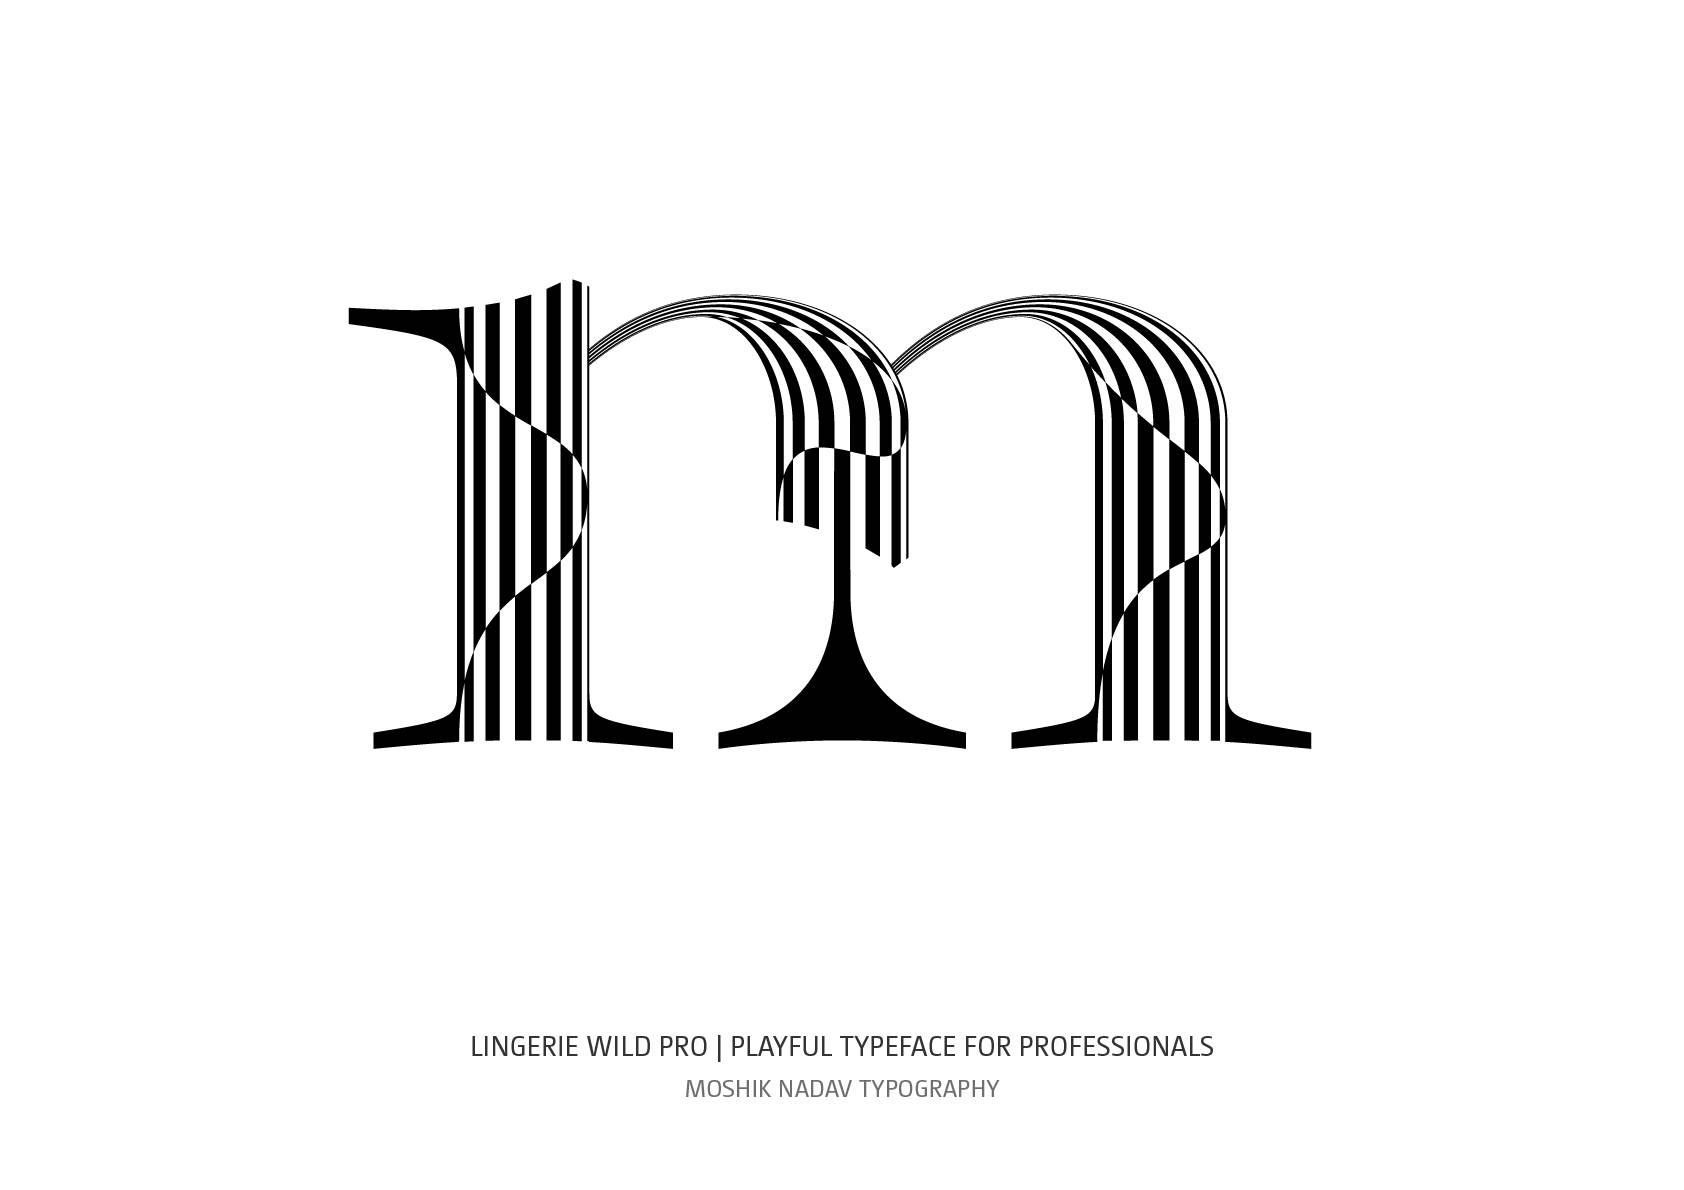 Professional typeface for fashion and luxury logos designed by Moshik Nadav Fashion Typography